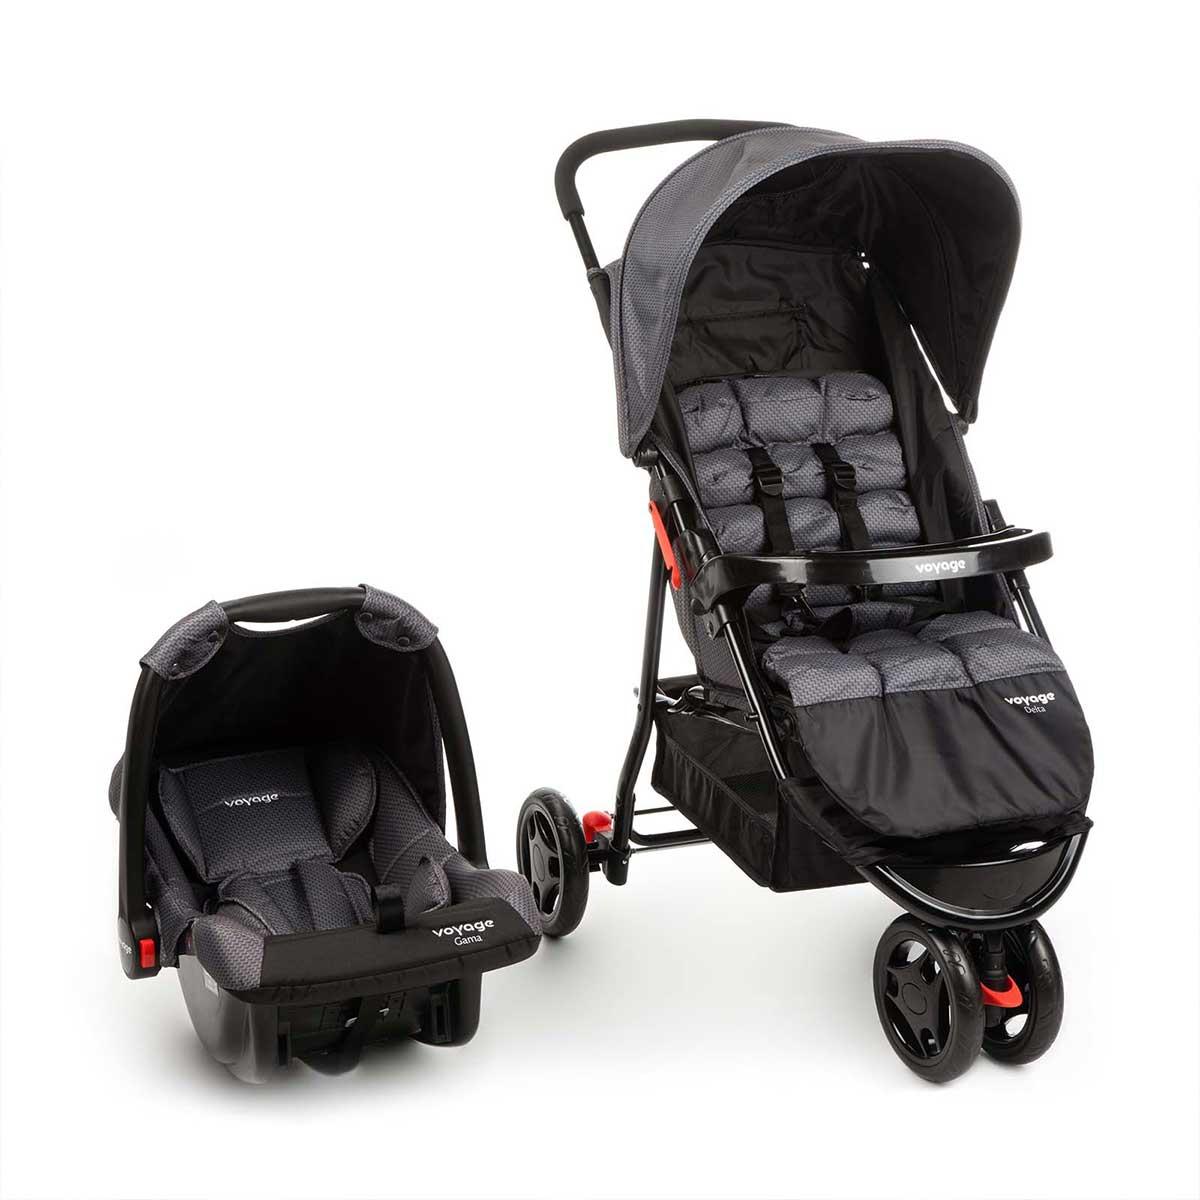 Carrinho com Bebê Conforto Travel System Delta Voyage Cinza